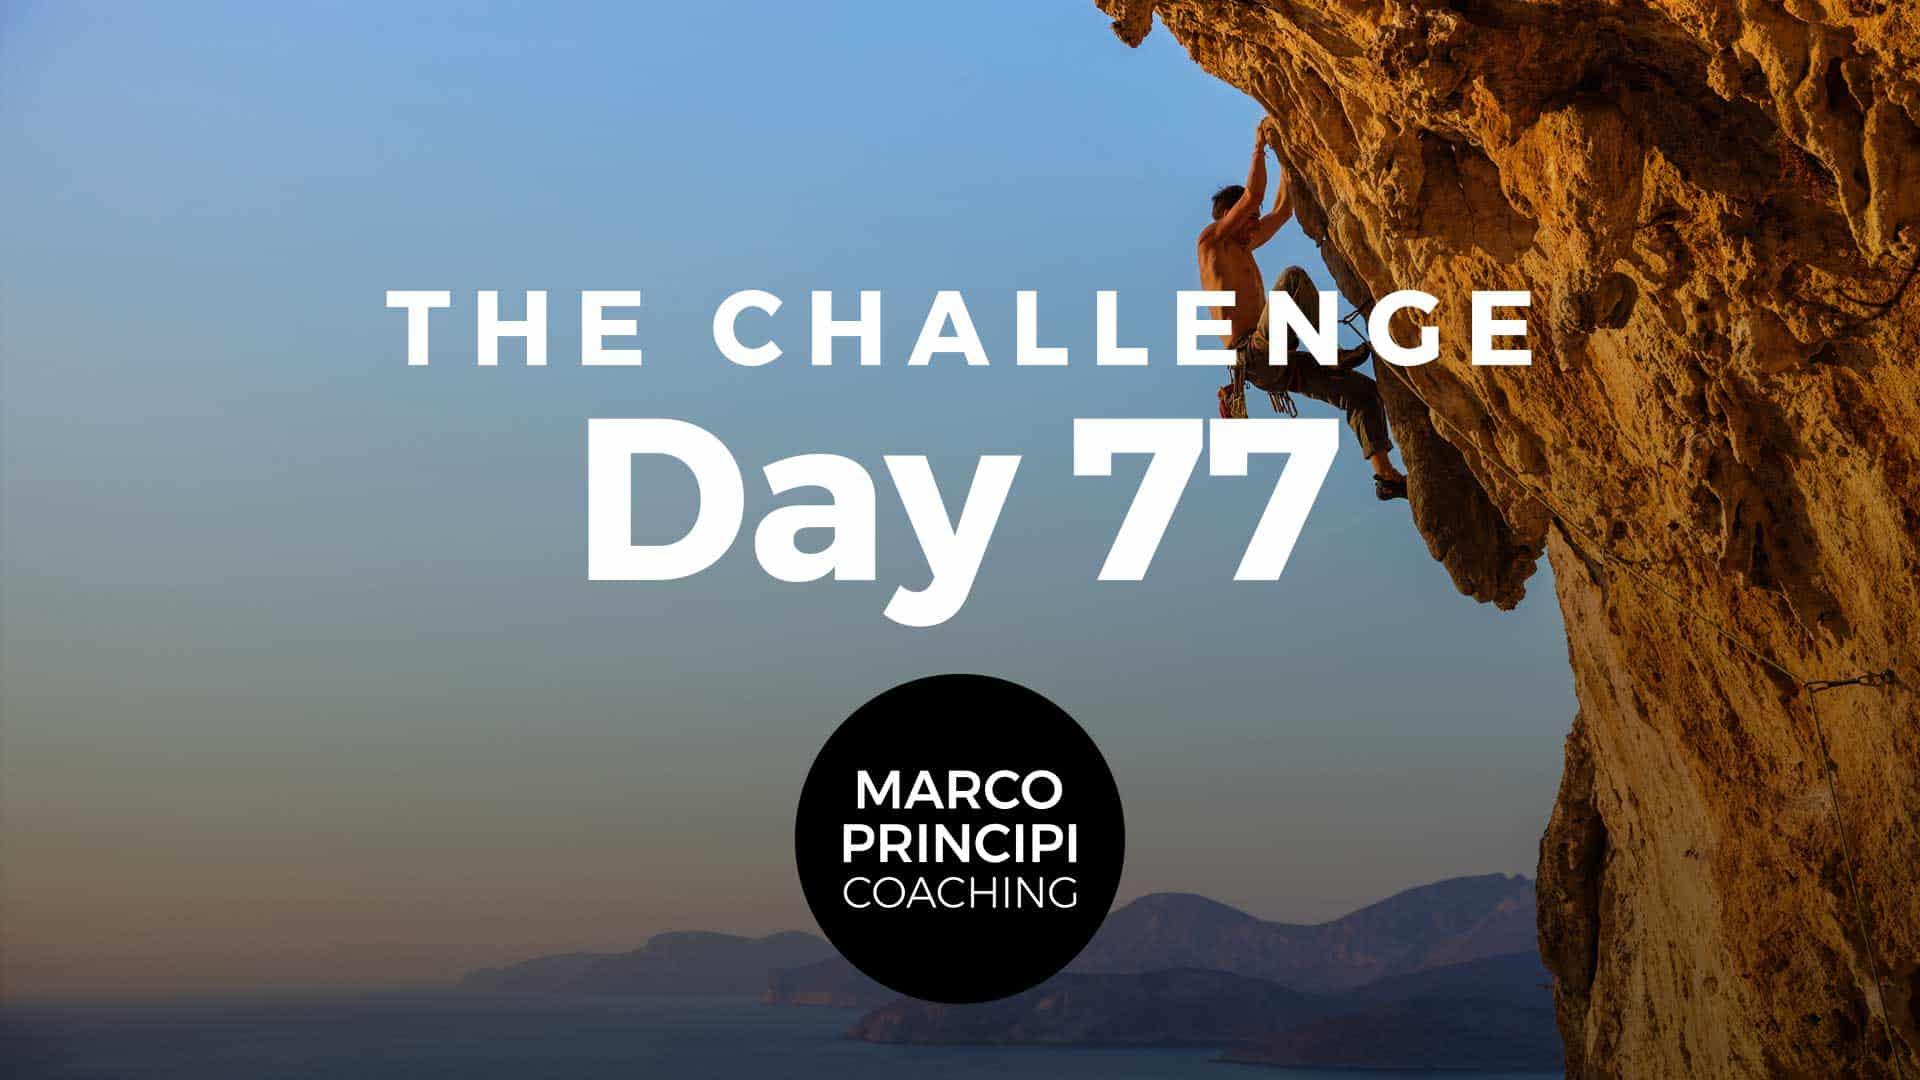 Marco Principi Coaching Challenge Day 77